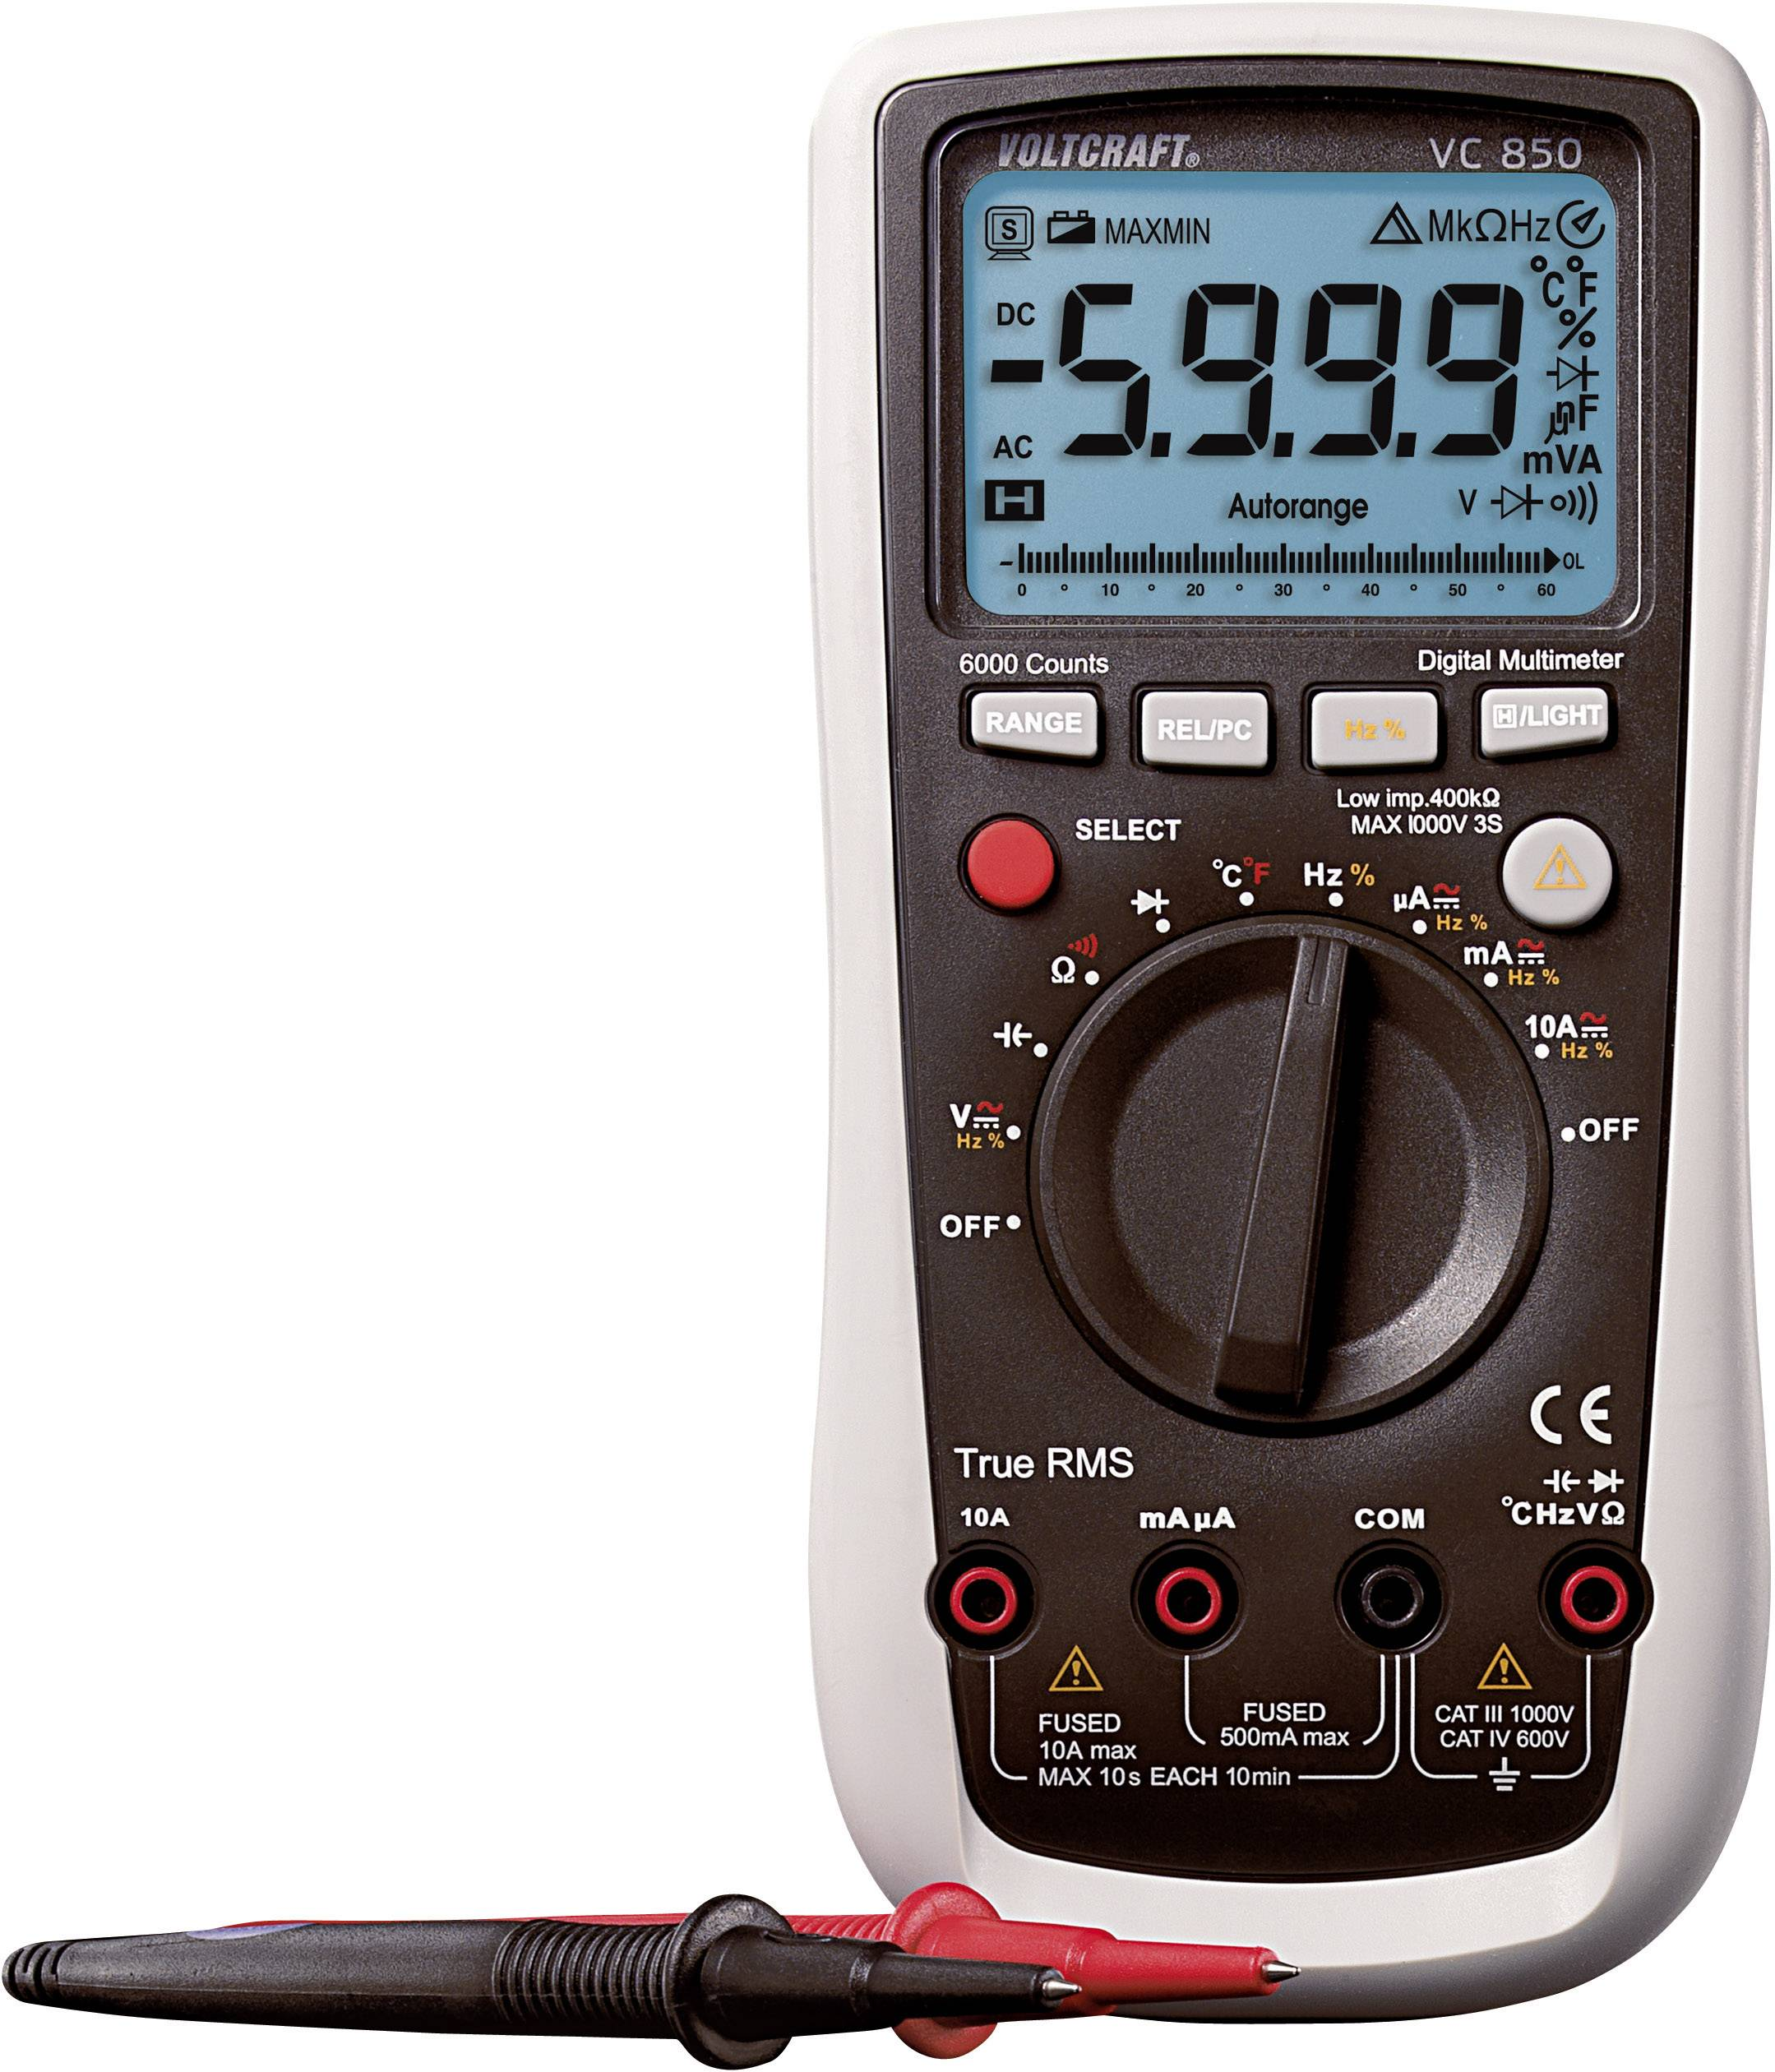 Digitálne/y ručný multimeter VOLTCRAFT VC850 VC850